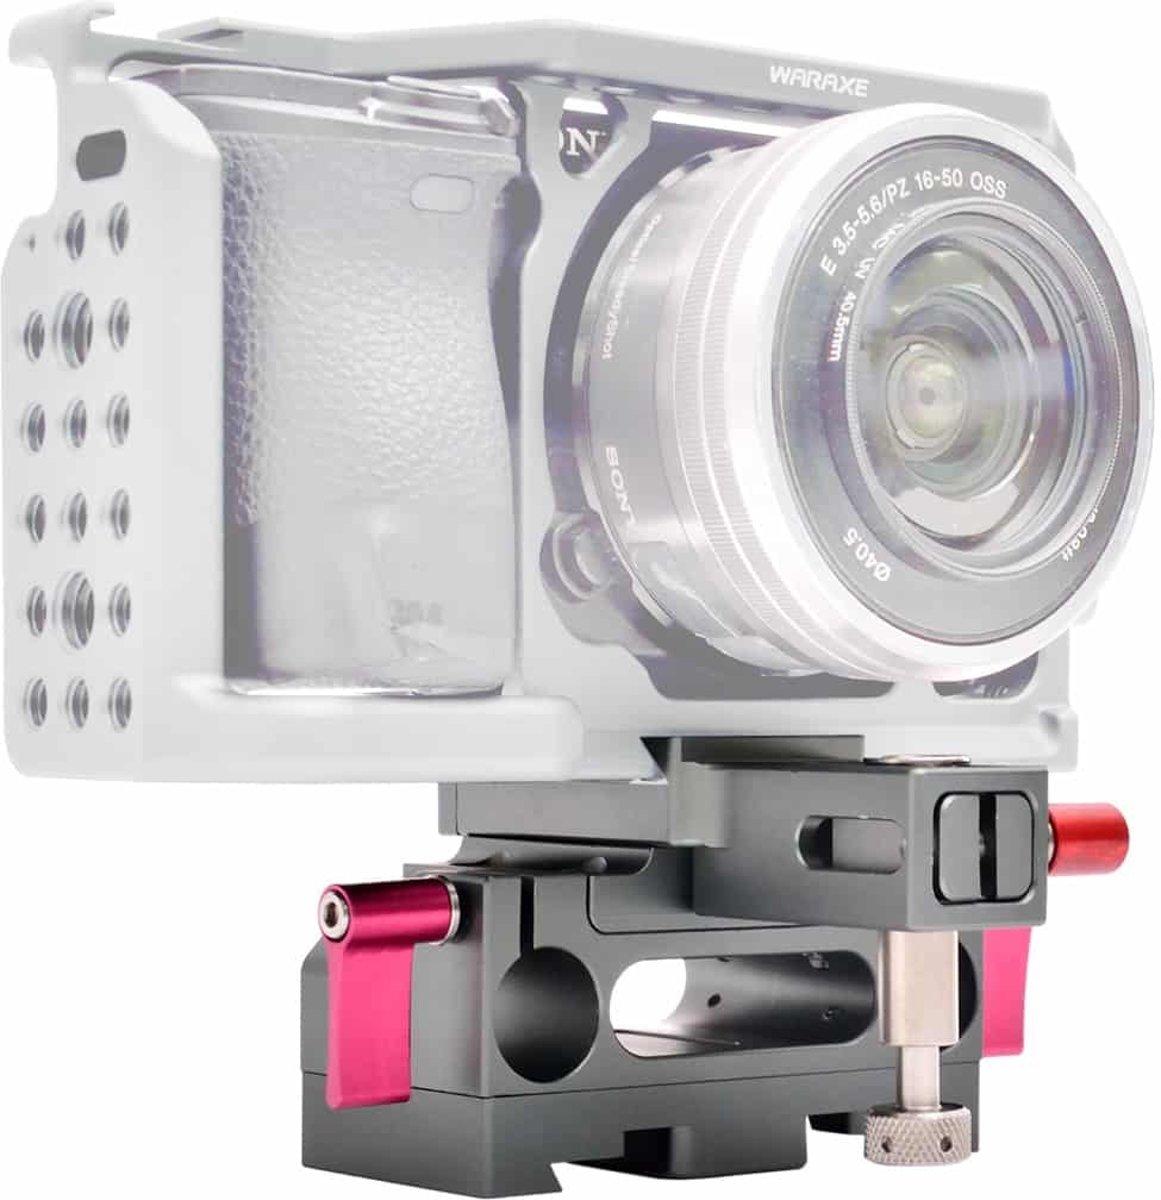 WARAXE 2631 Rig grondplaat met Arca Style zwaluwstaart klem voor Sony GH4 / GH5 / A7 / A6 camerakooi, 15 mm Rod Hole kopen